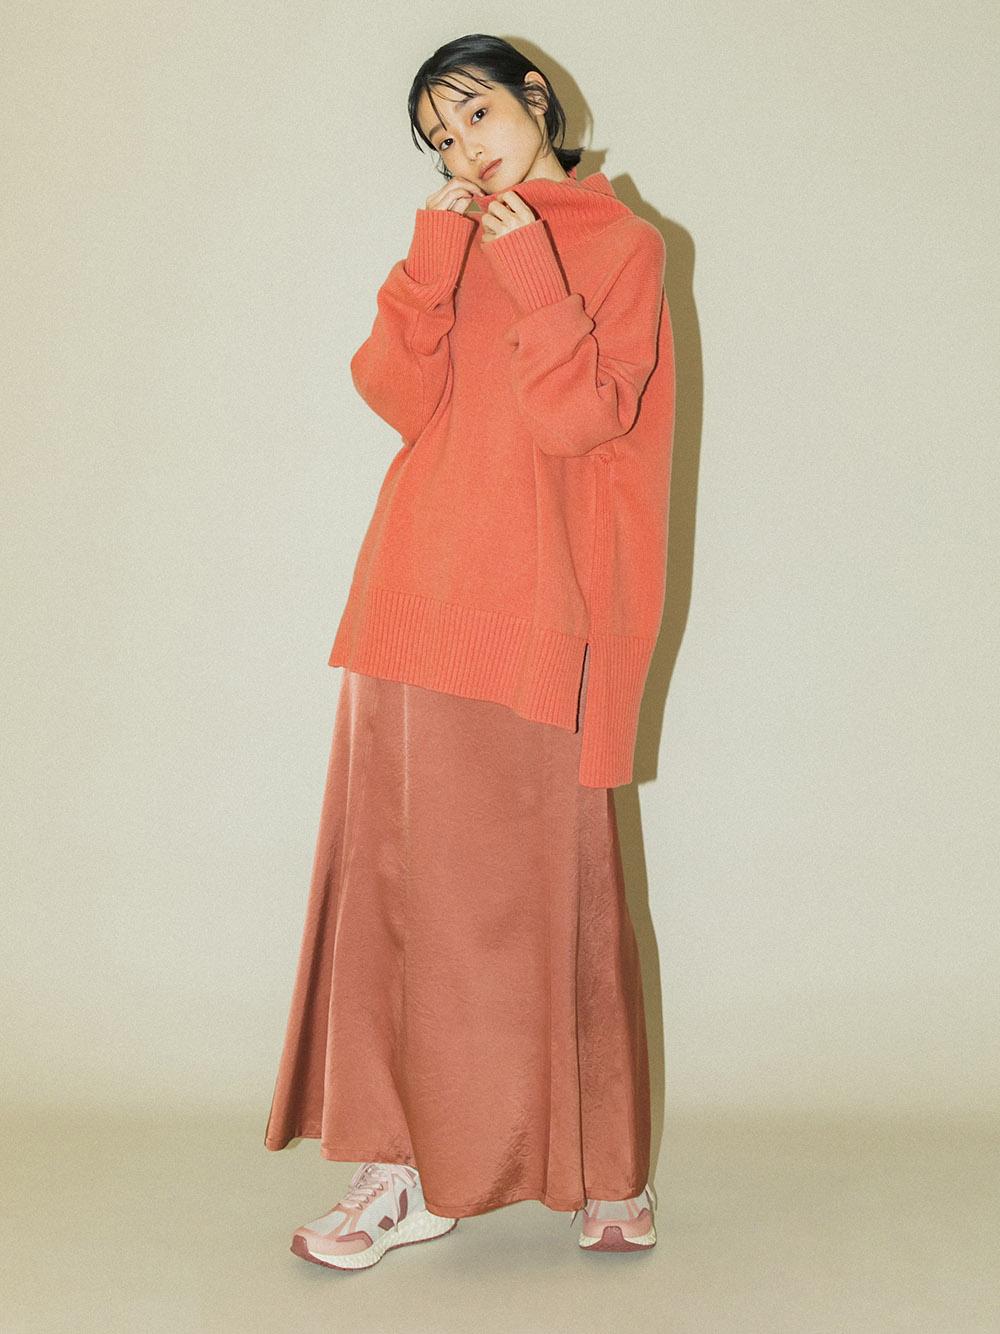 【emmi atelier】ハイウエストサテンスカート